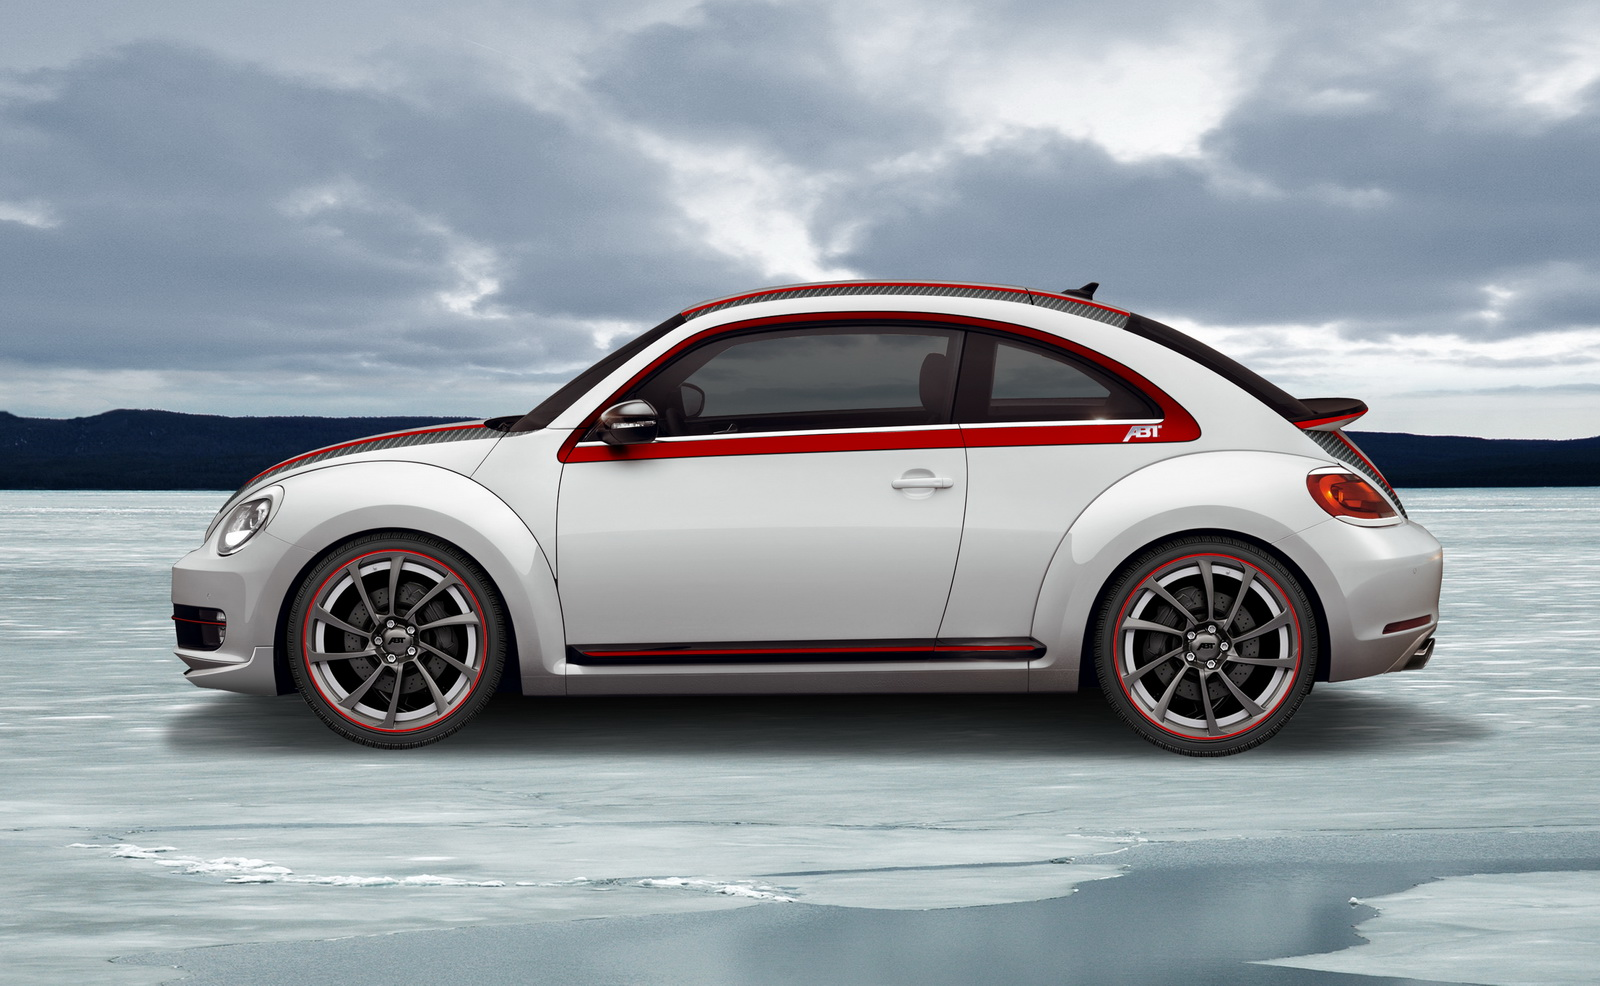 The new ABT Beetle ~ Auto Car